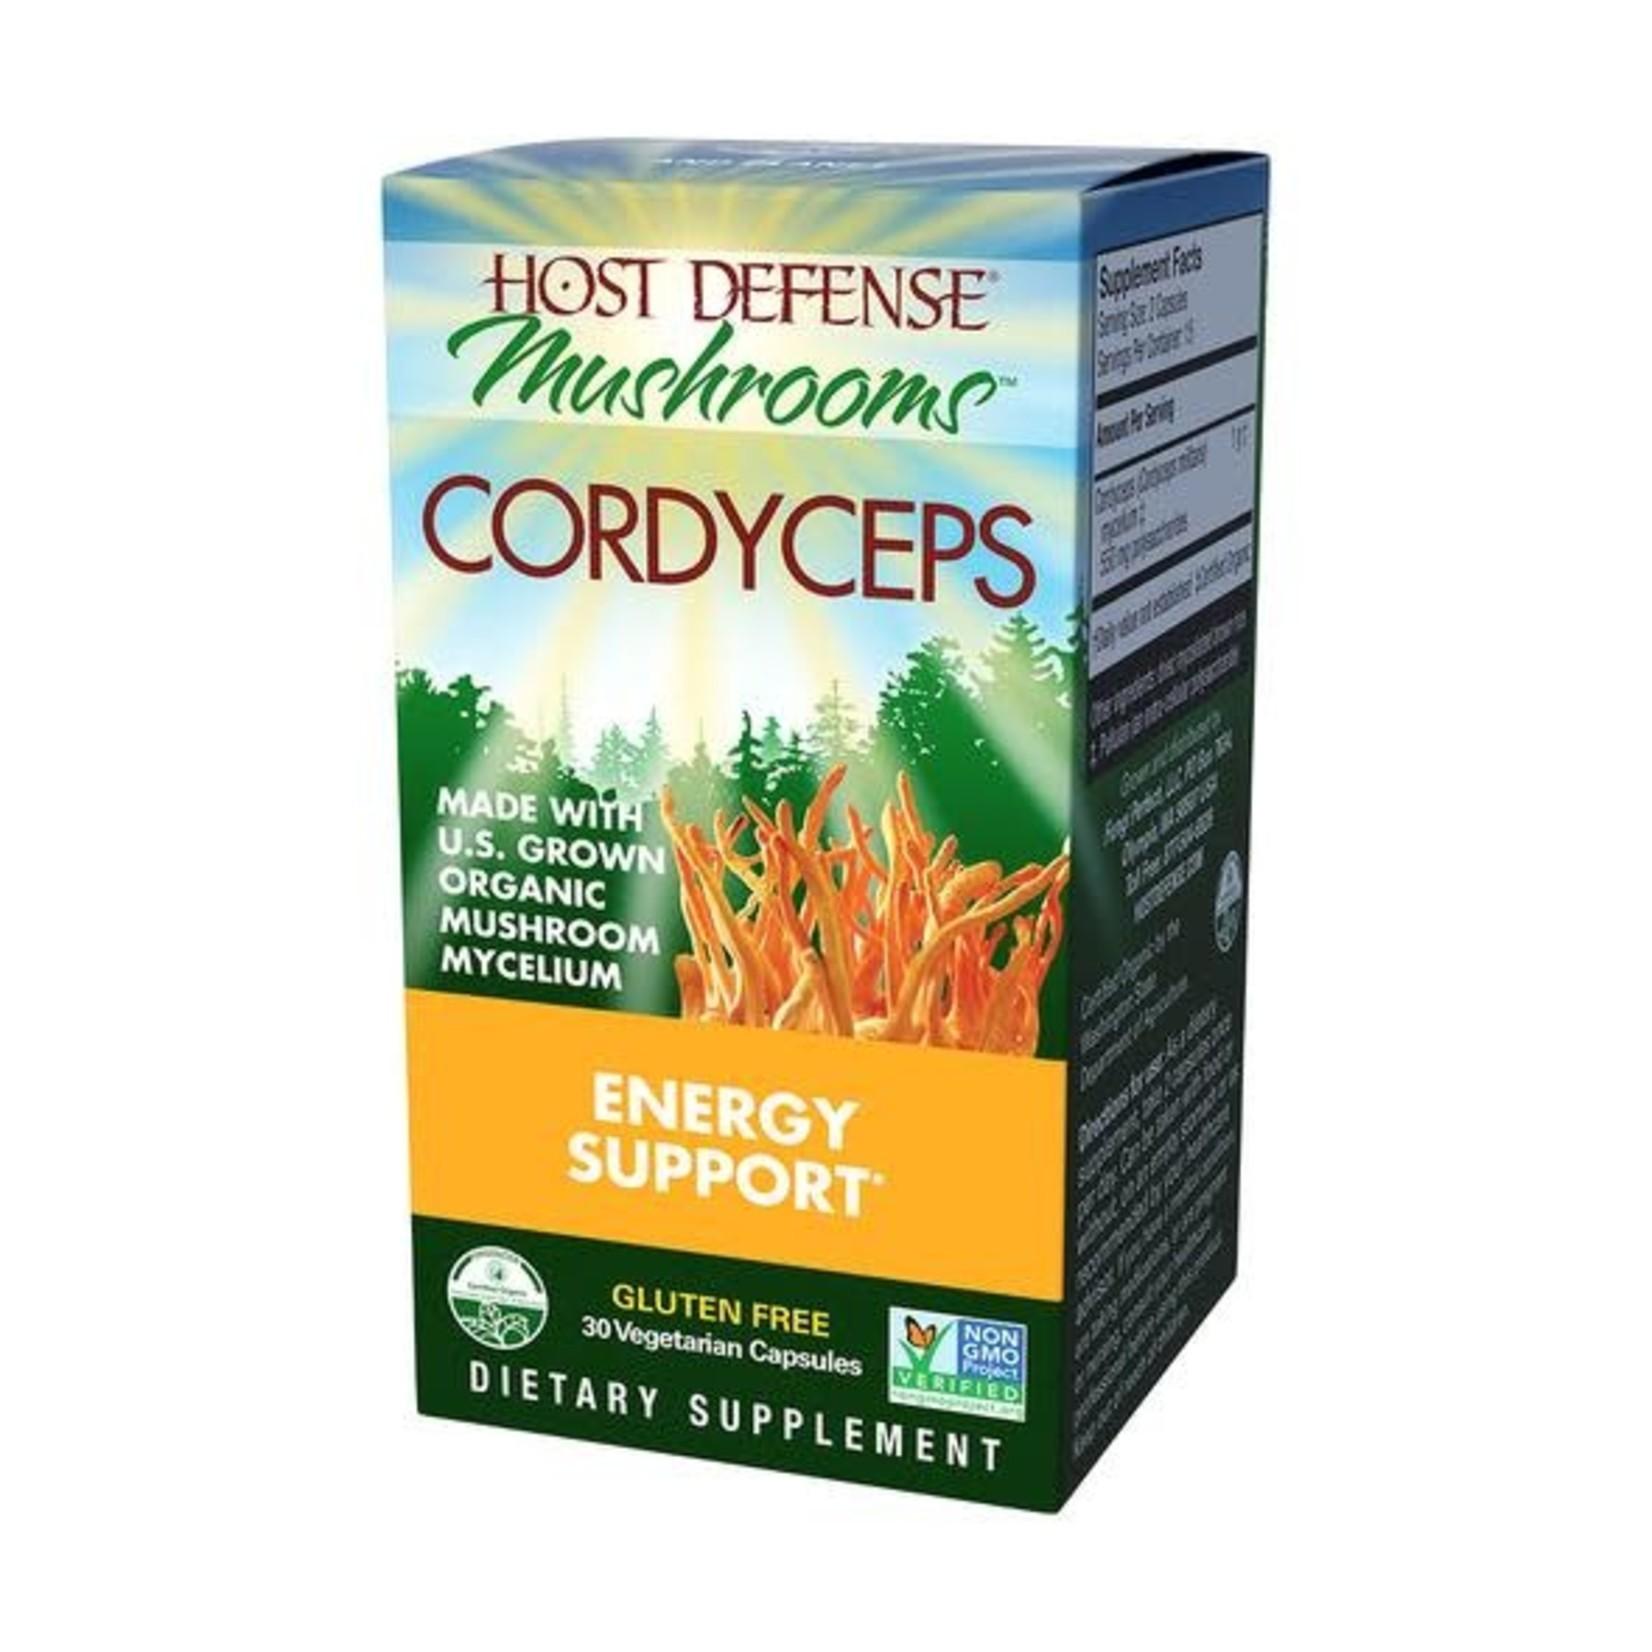 Host Defense HD Cordyceps Mushroom Capsules